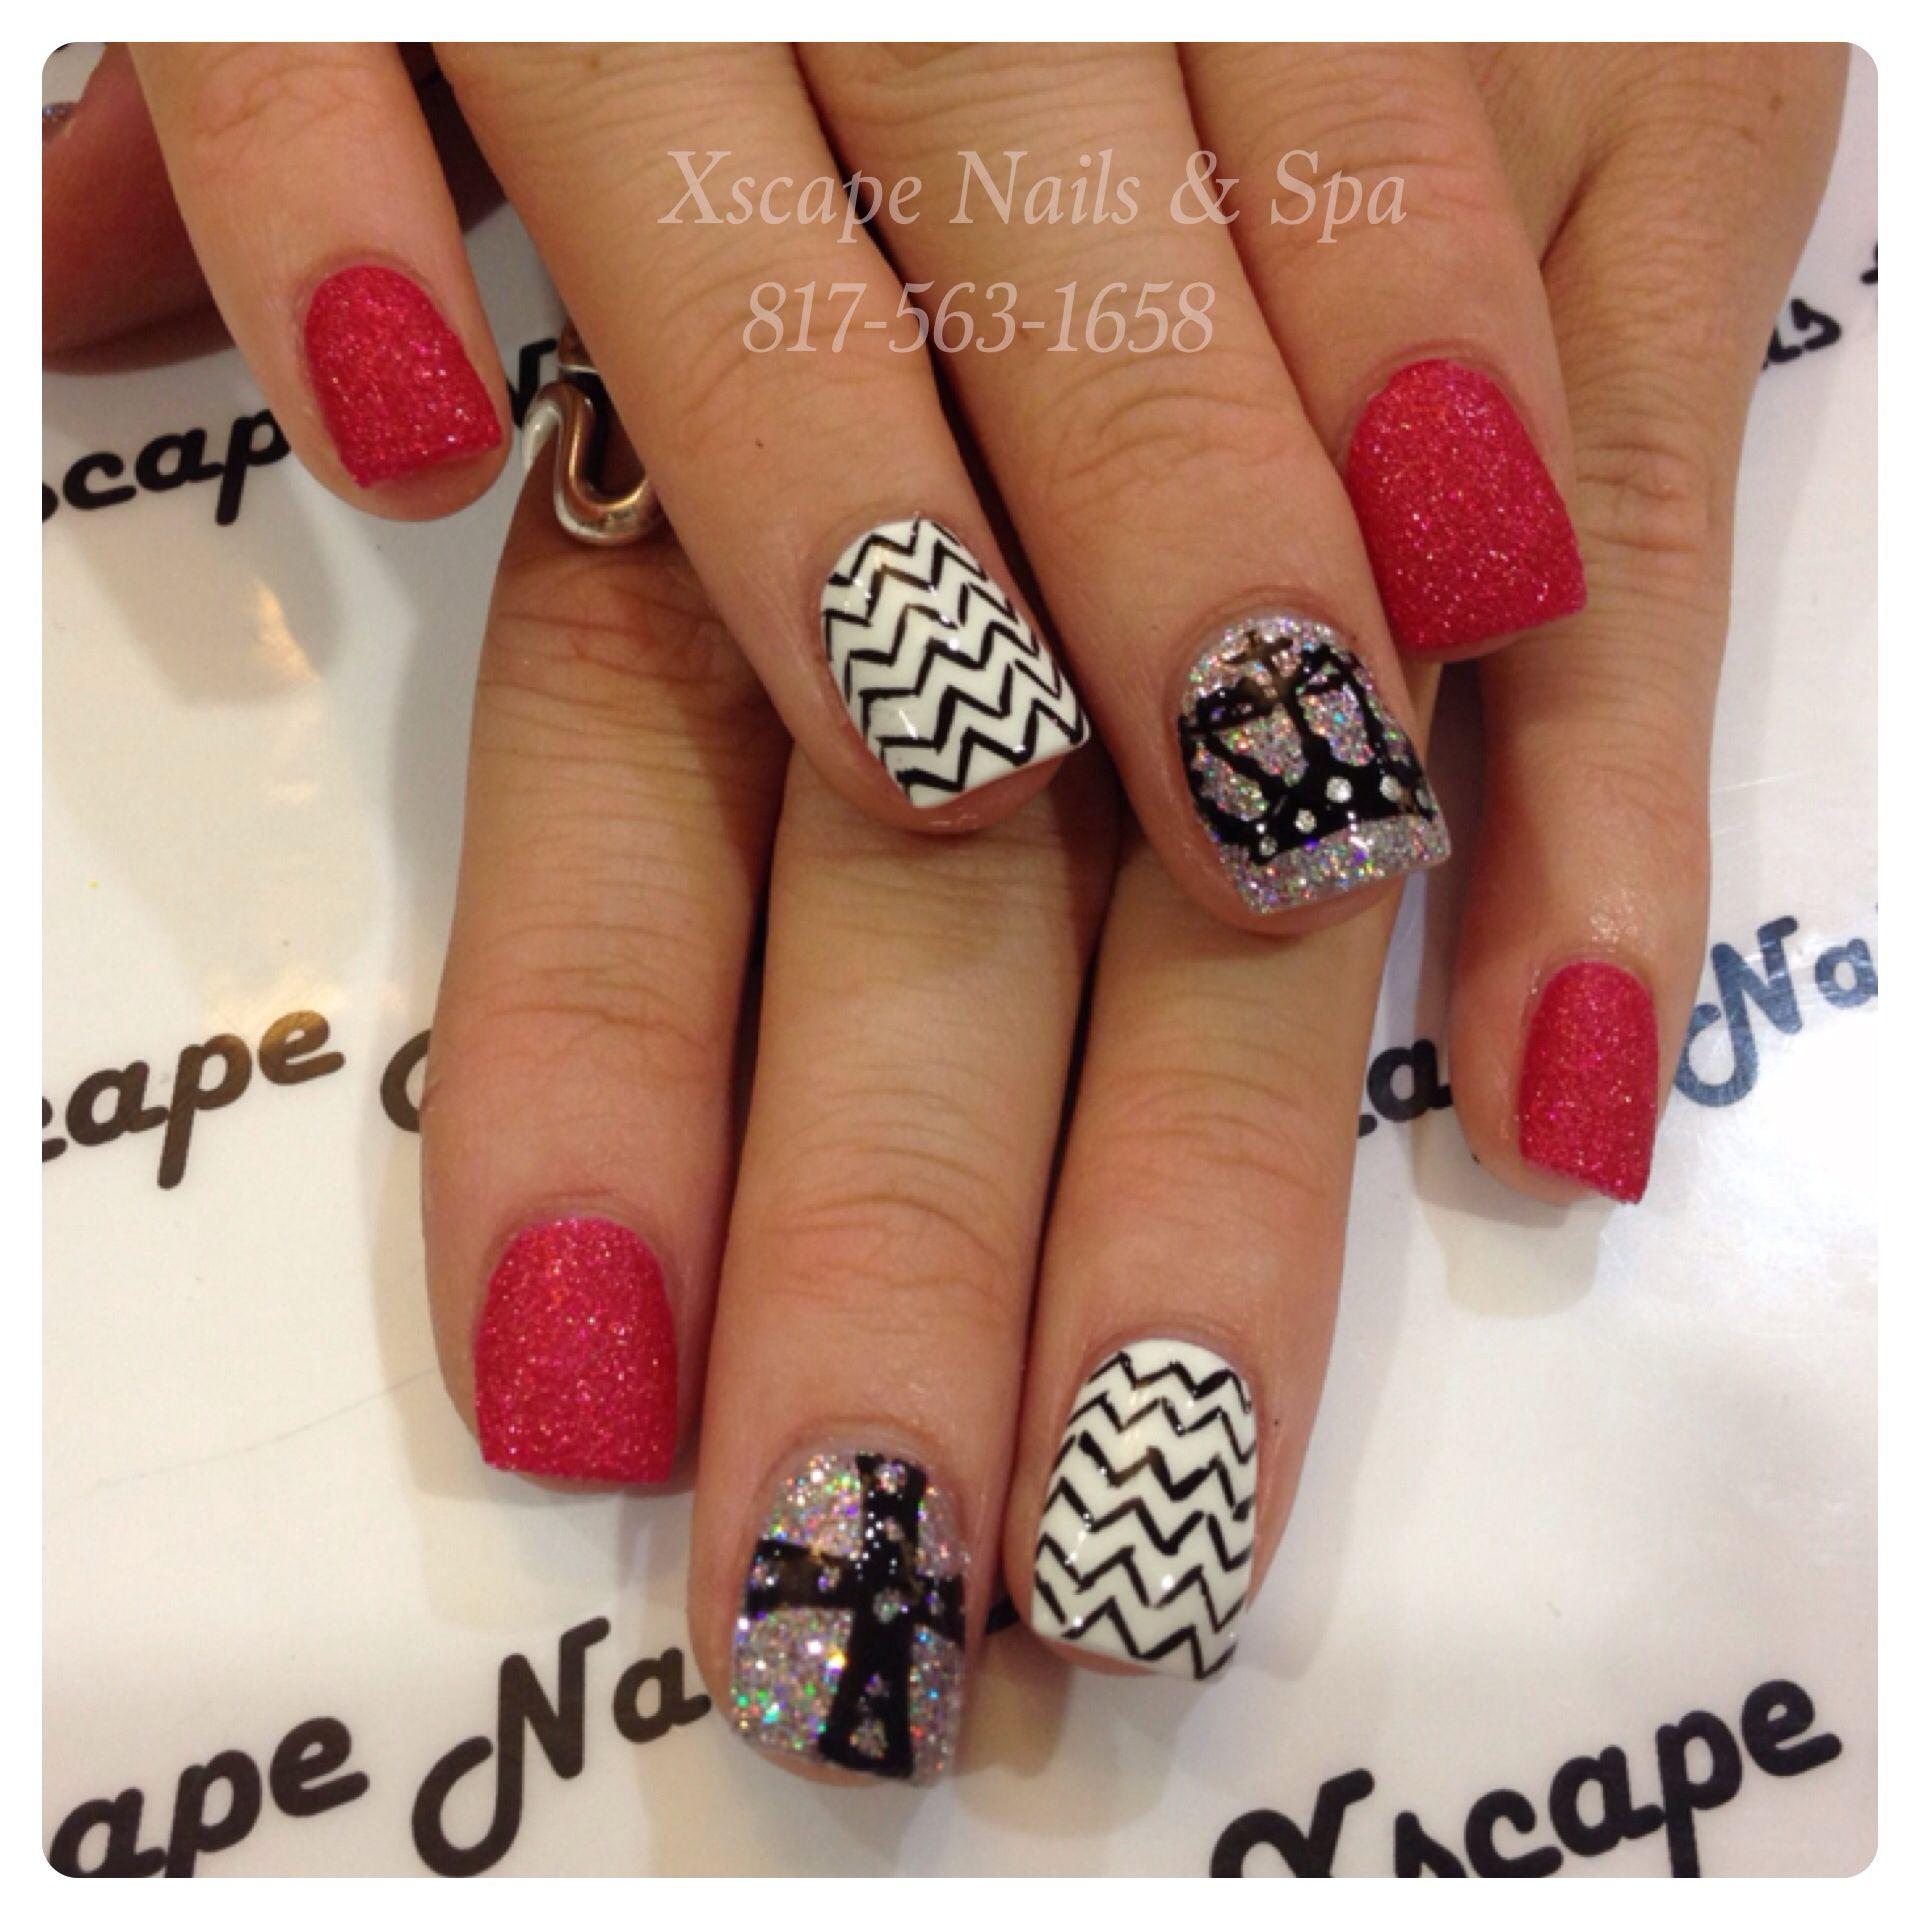 Crown/Cross nail designs   Nails   Pinterest   Cross nail designs ...